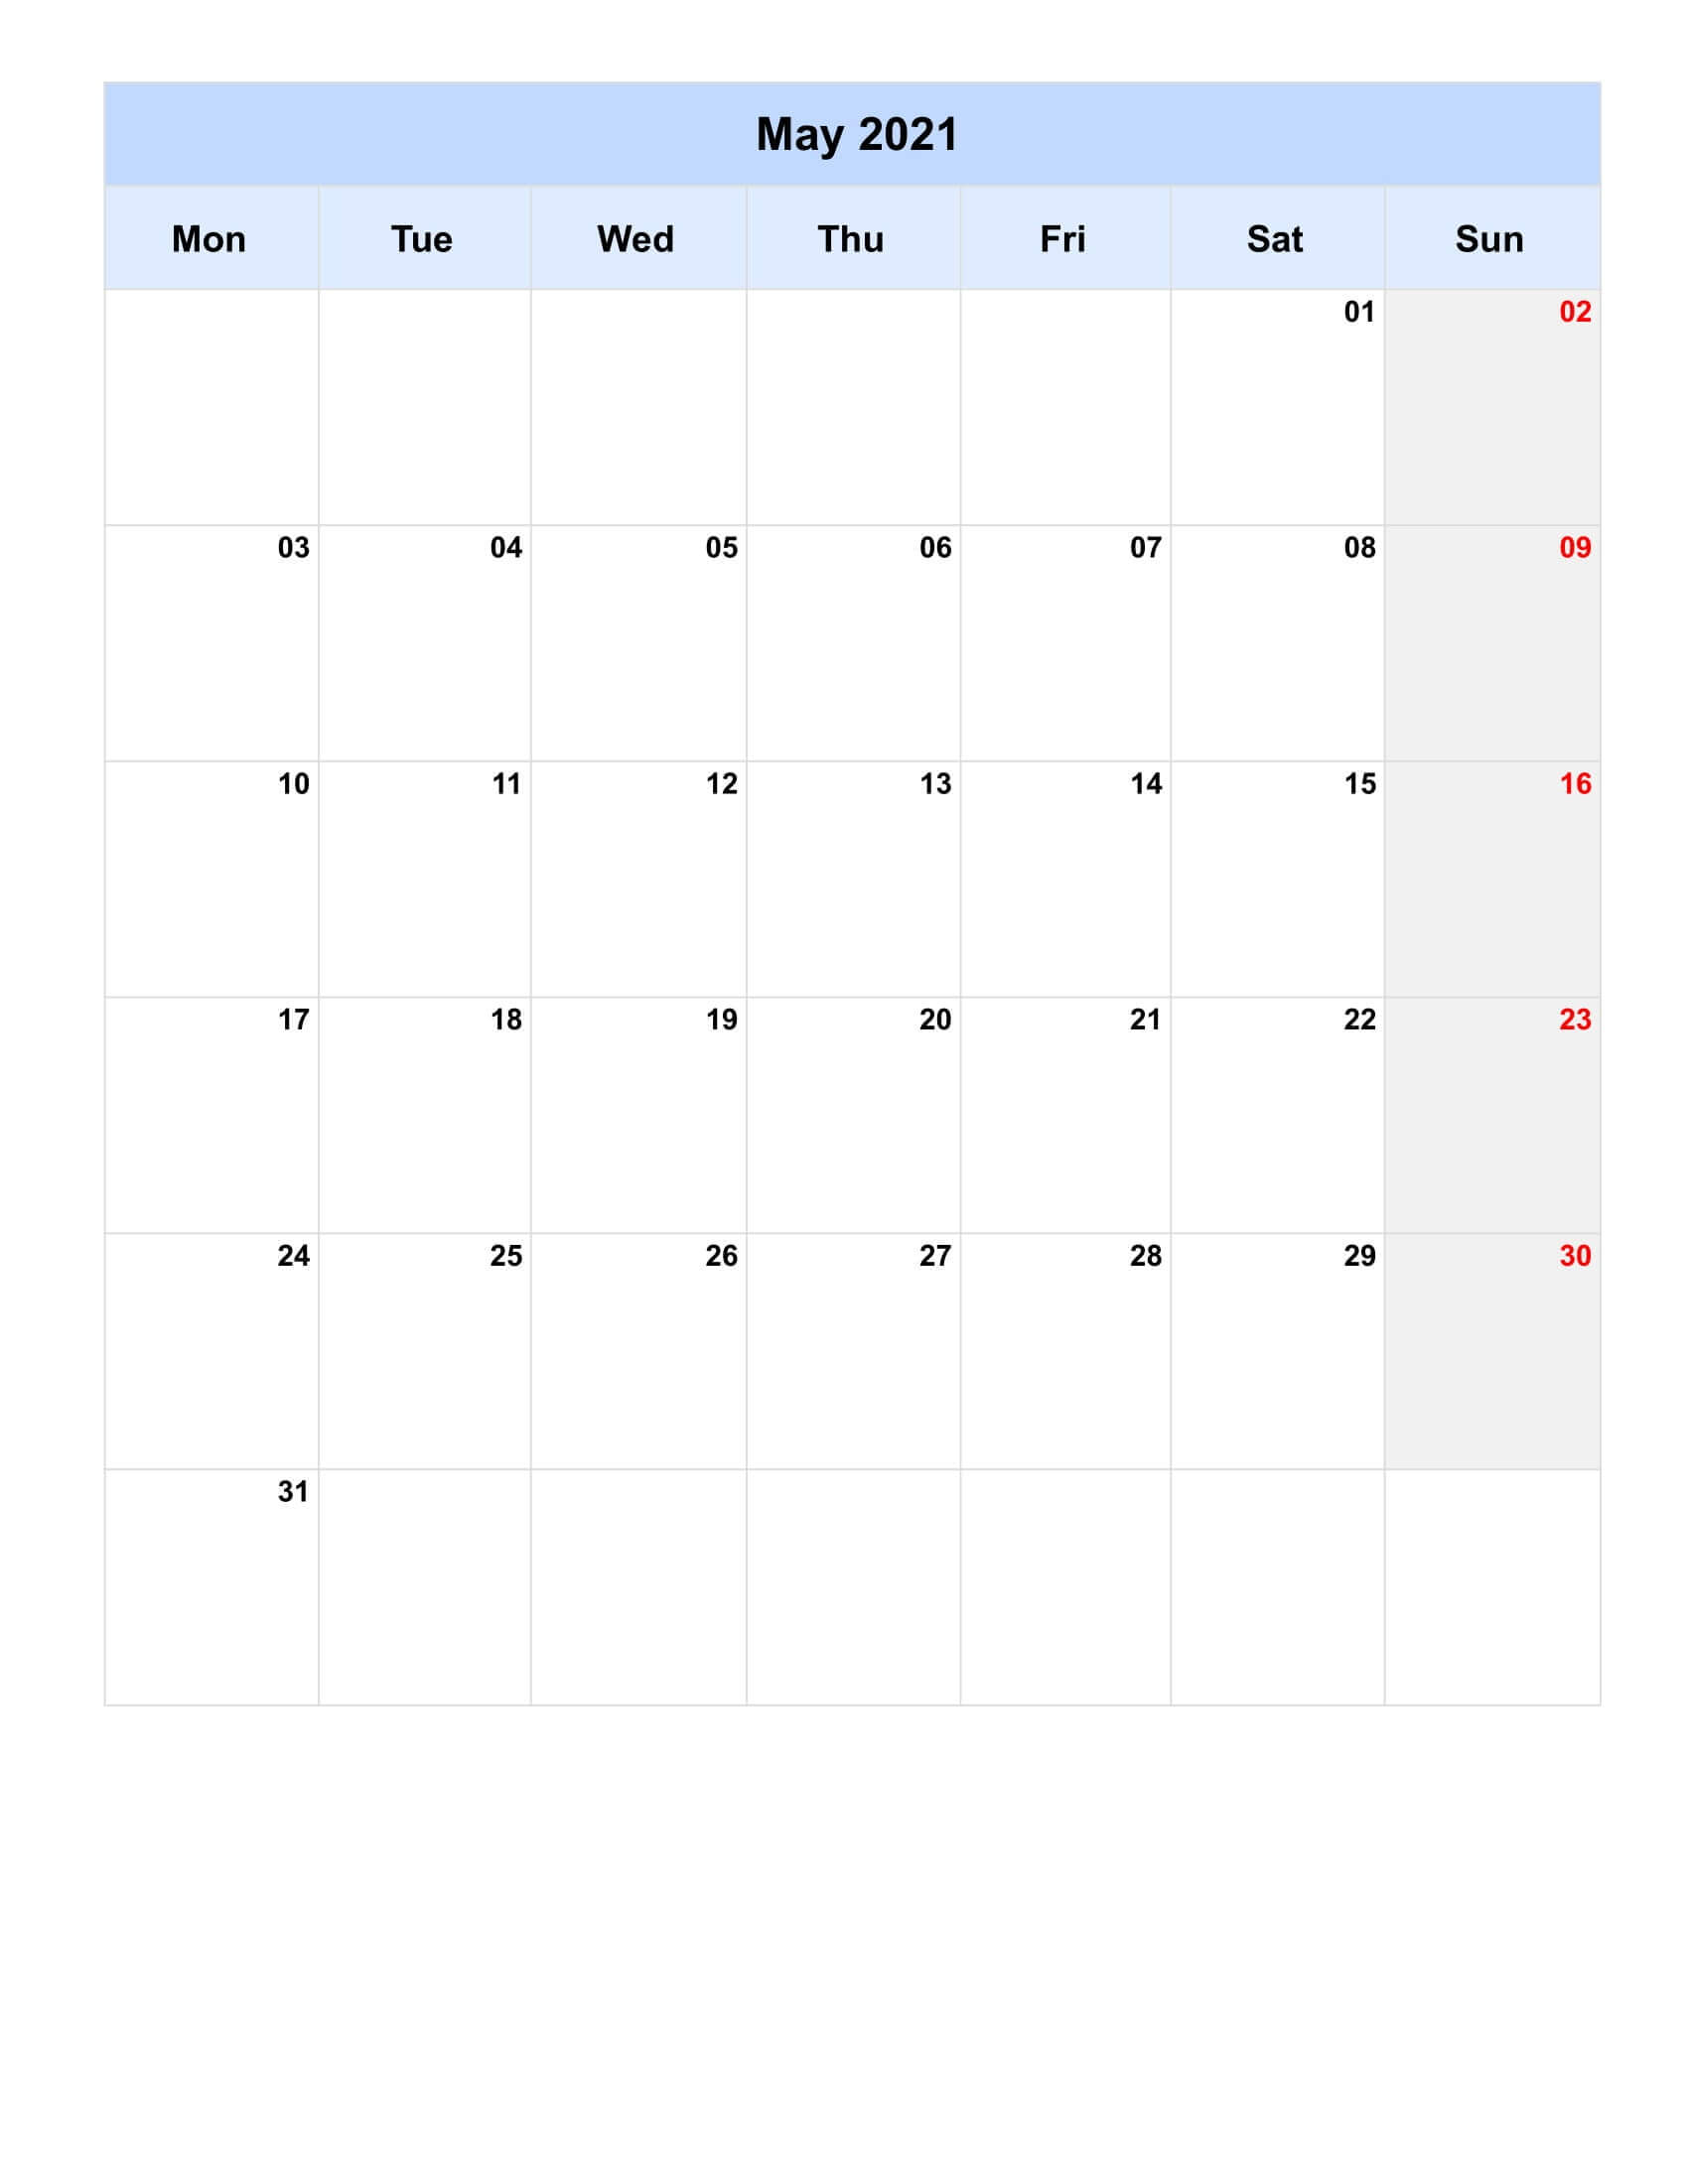 Print May 2021 Calendar Excel